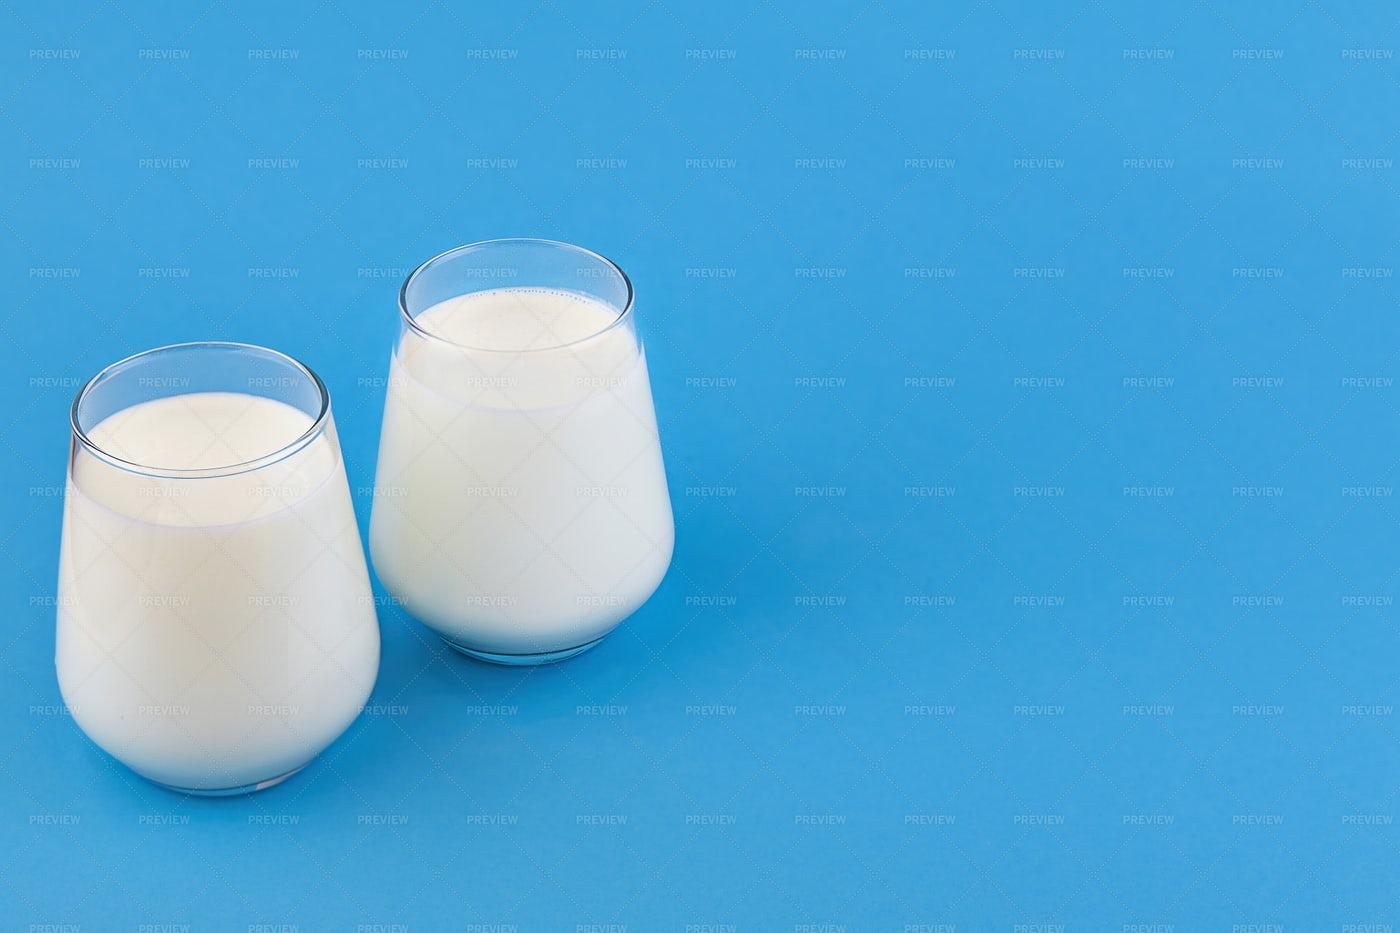 Probiotic Kefir And Yogurt Background: Stock Photos